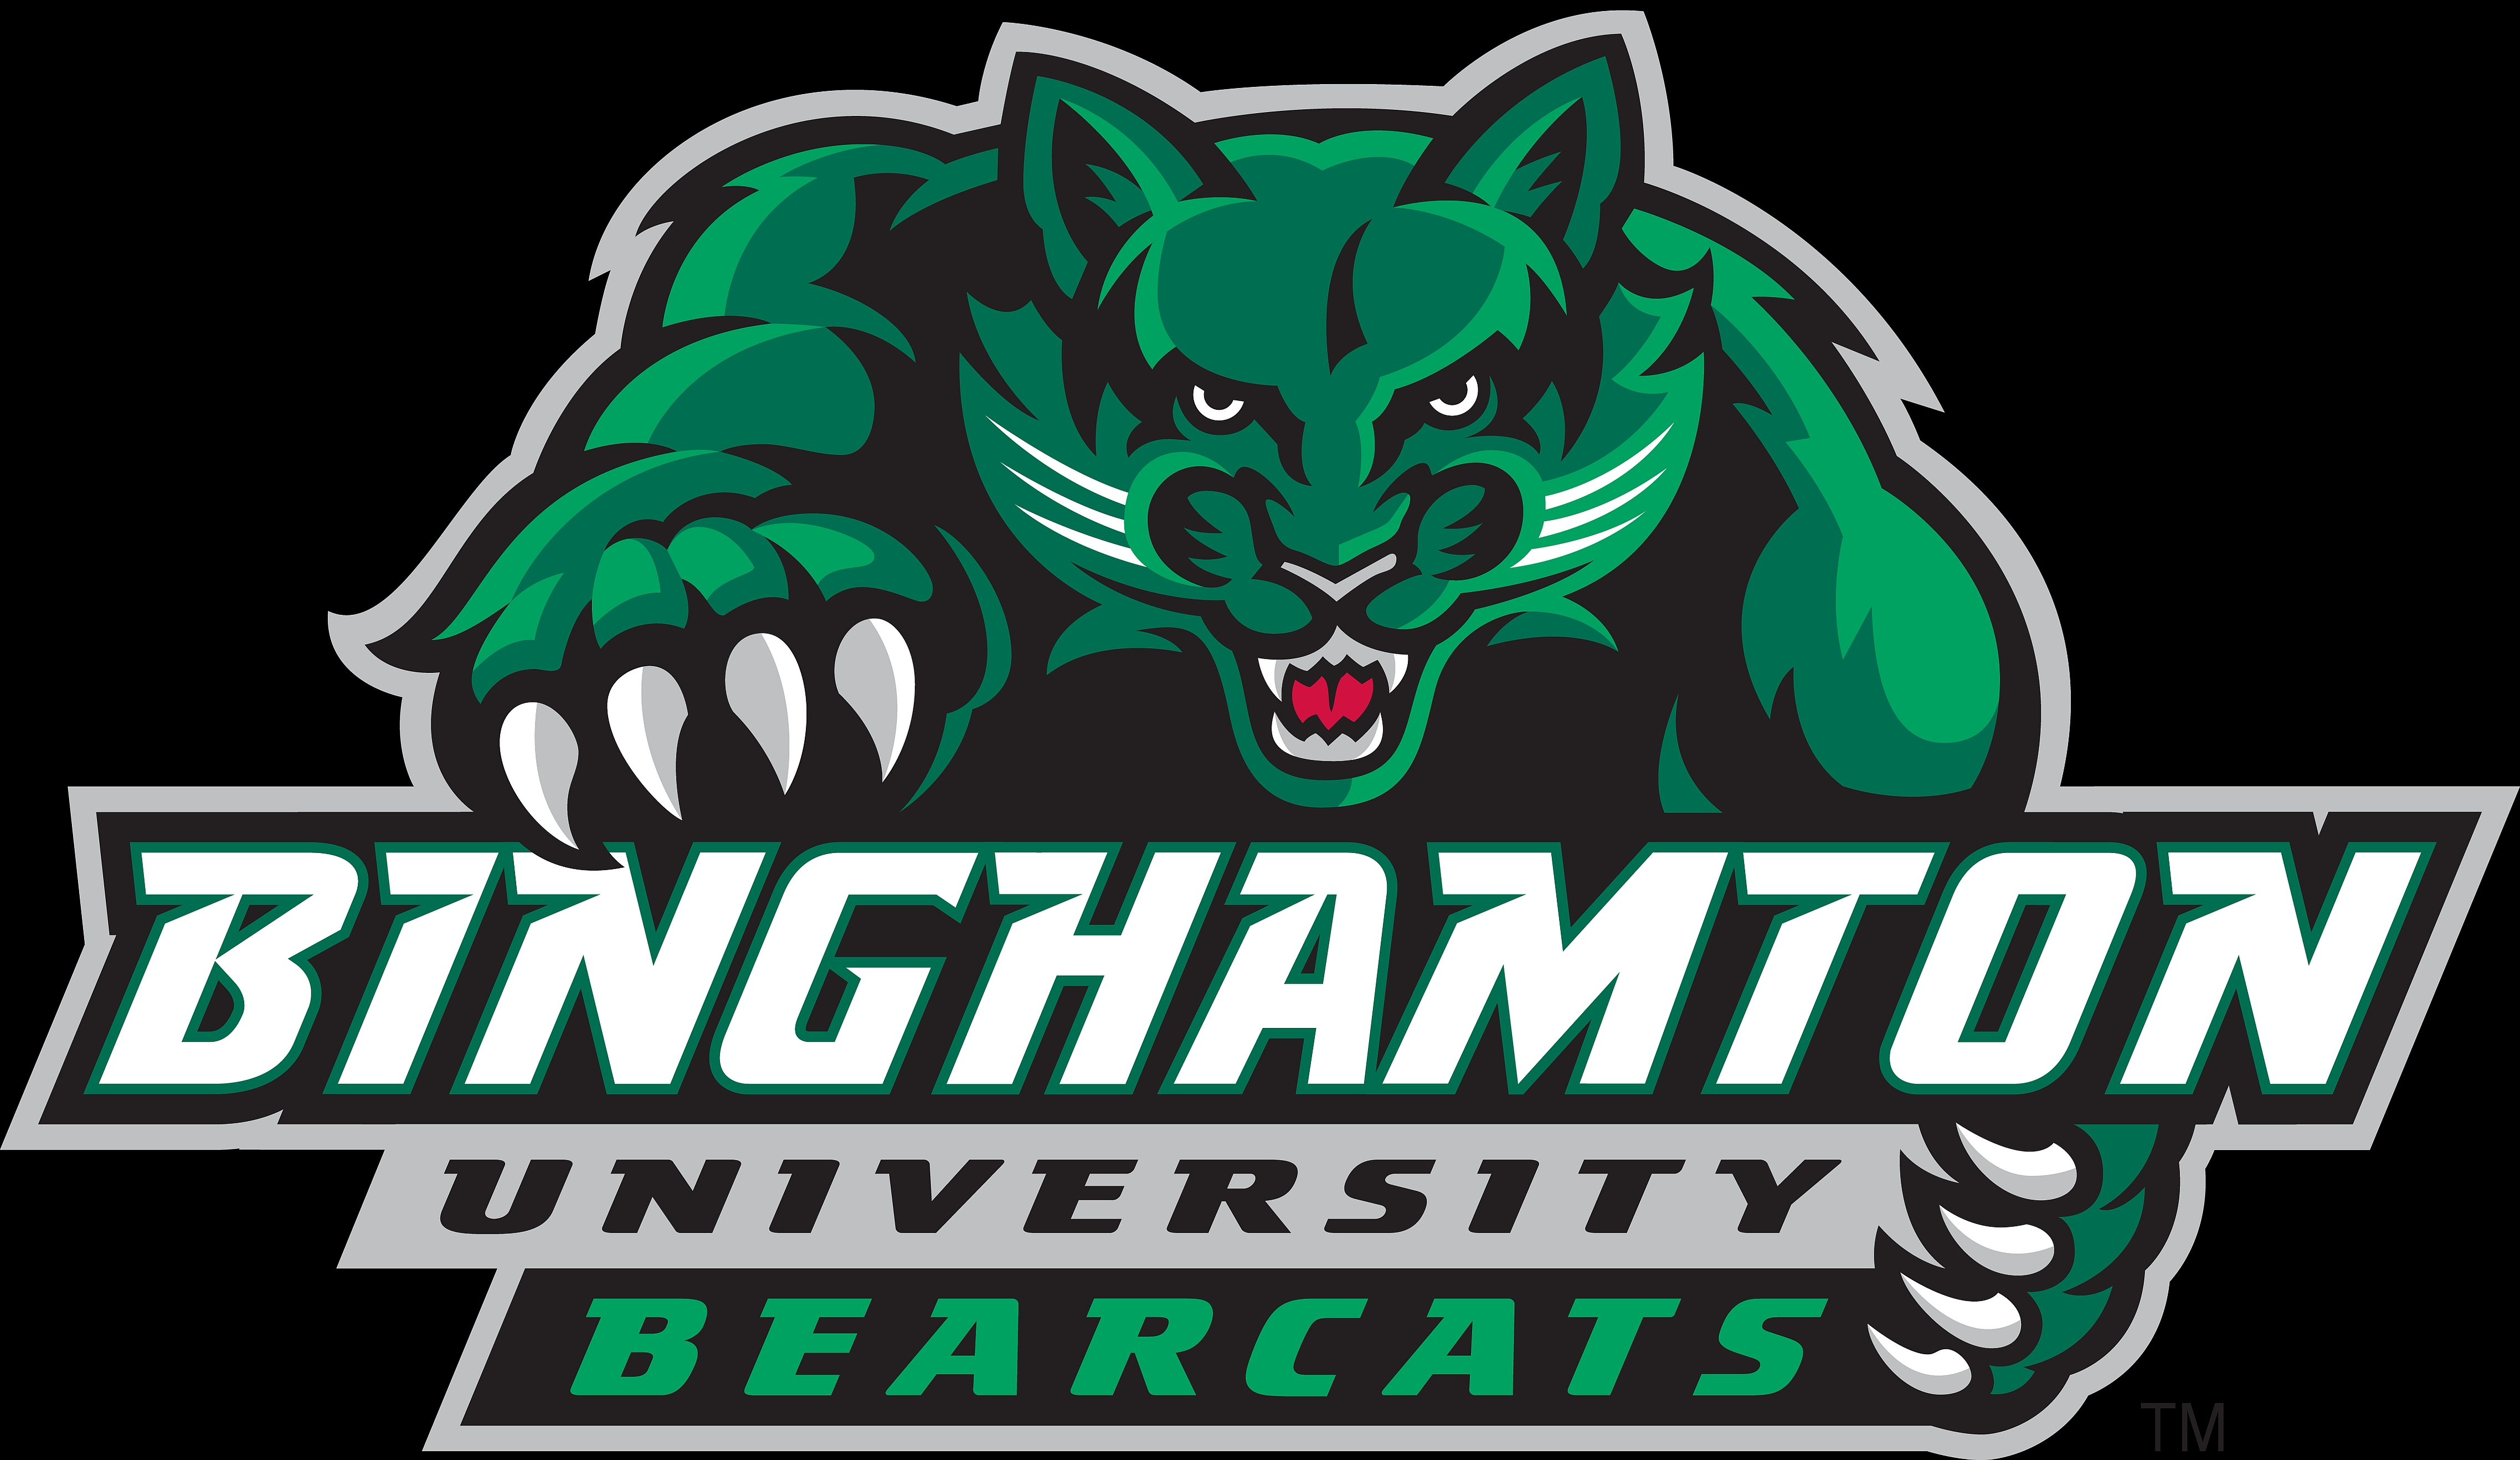 High Resolution Wallpaper | Binghamton University Bearcats 4550x2636 px